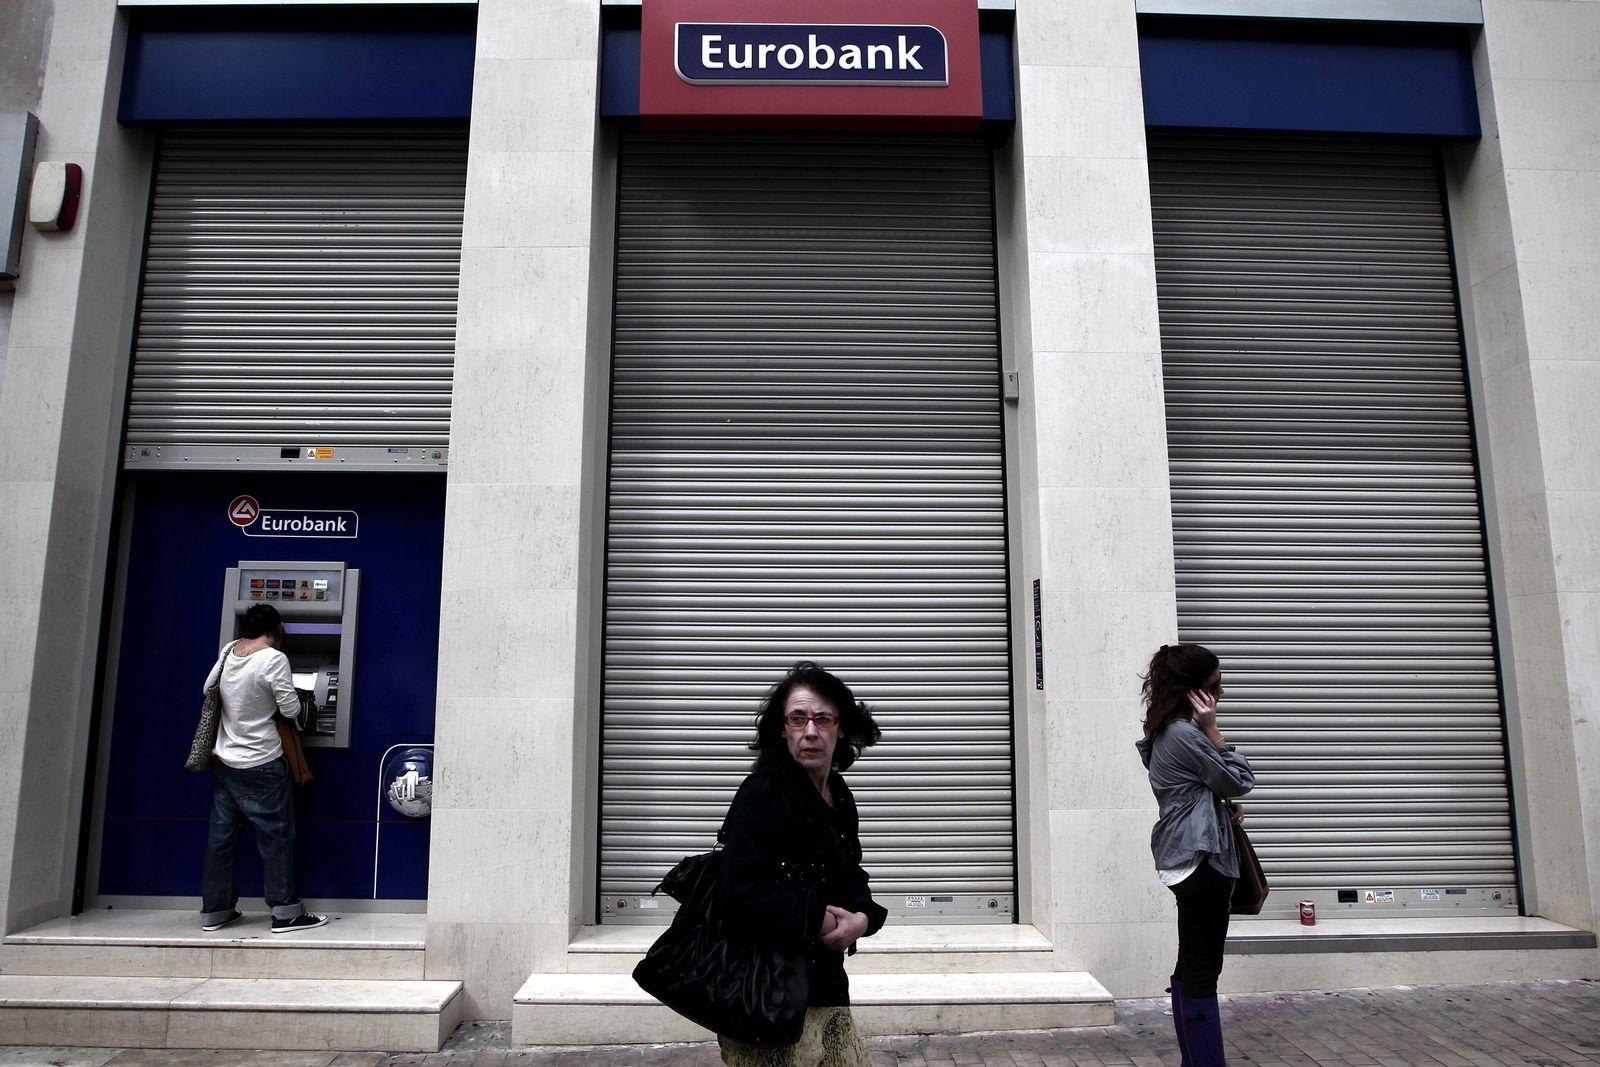 Griechenland / Eurobank / Stresstest